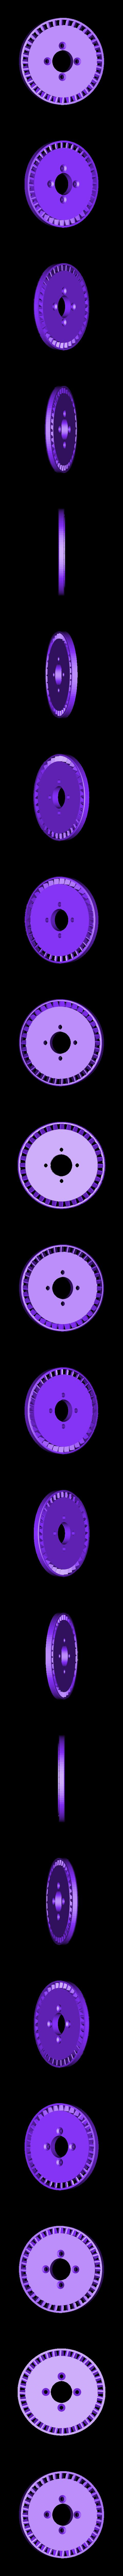 HPT-Rotor01.stl Download free STL file Jet Engine, 3-Spool • 3D printable object, konchan77